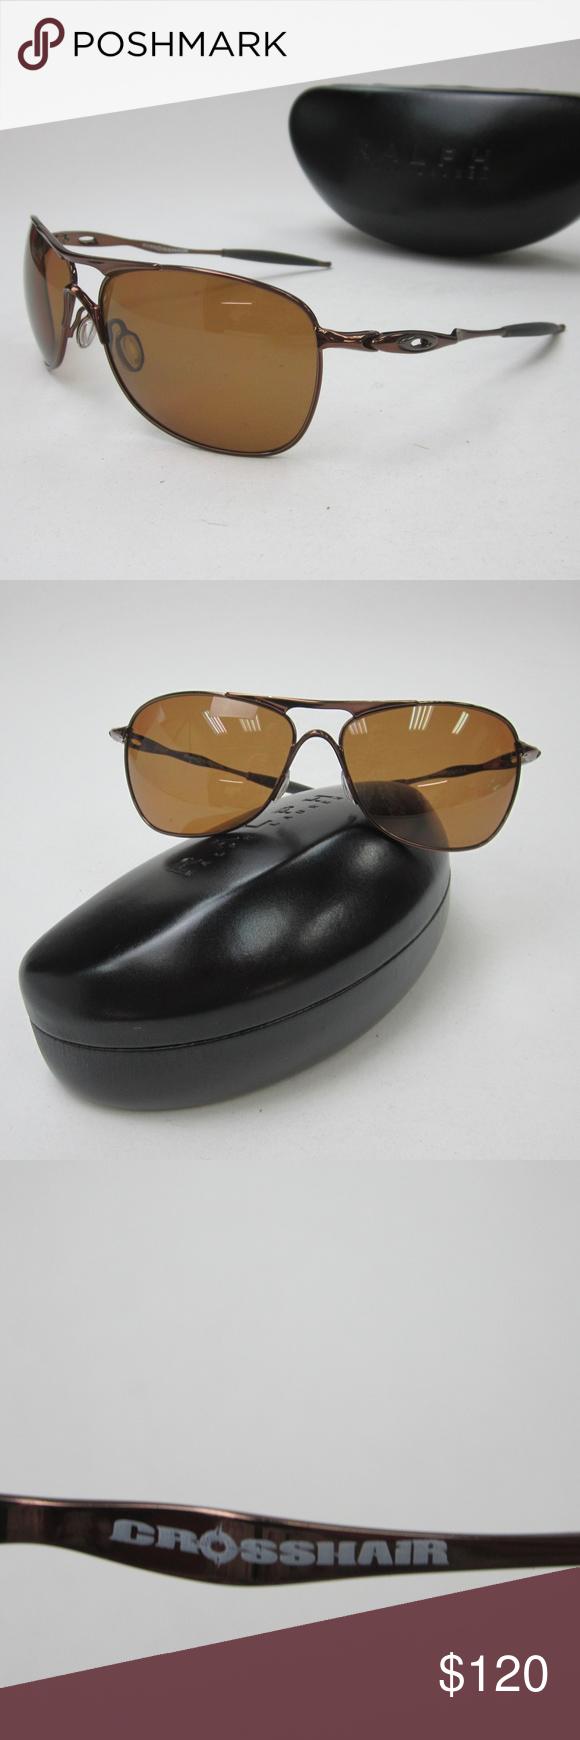 3c821396f1 Oakley CROSSHAIR OO4060-04 PLZ Sunglasses  OLN154 Oakley CROSSHAIR OO4060-04  Aviator Sunglasses